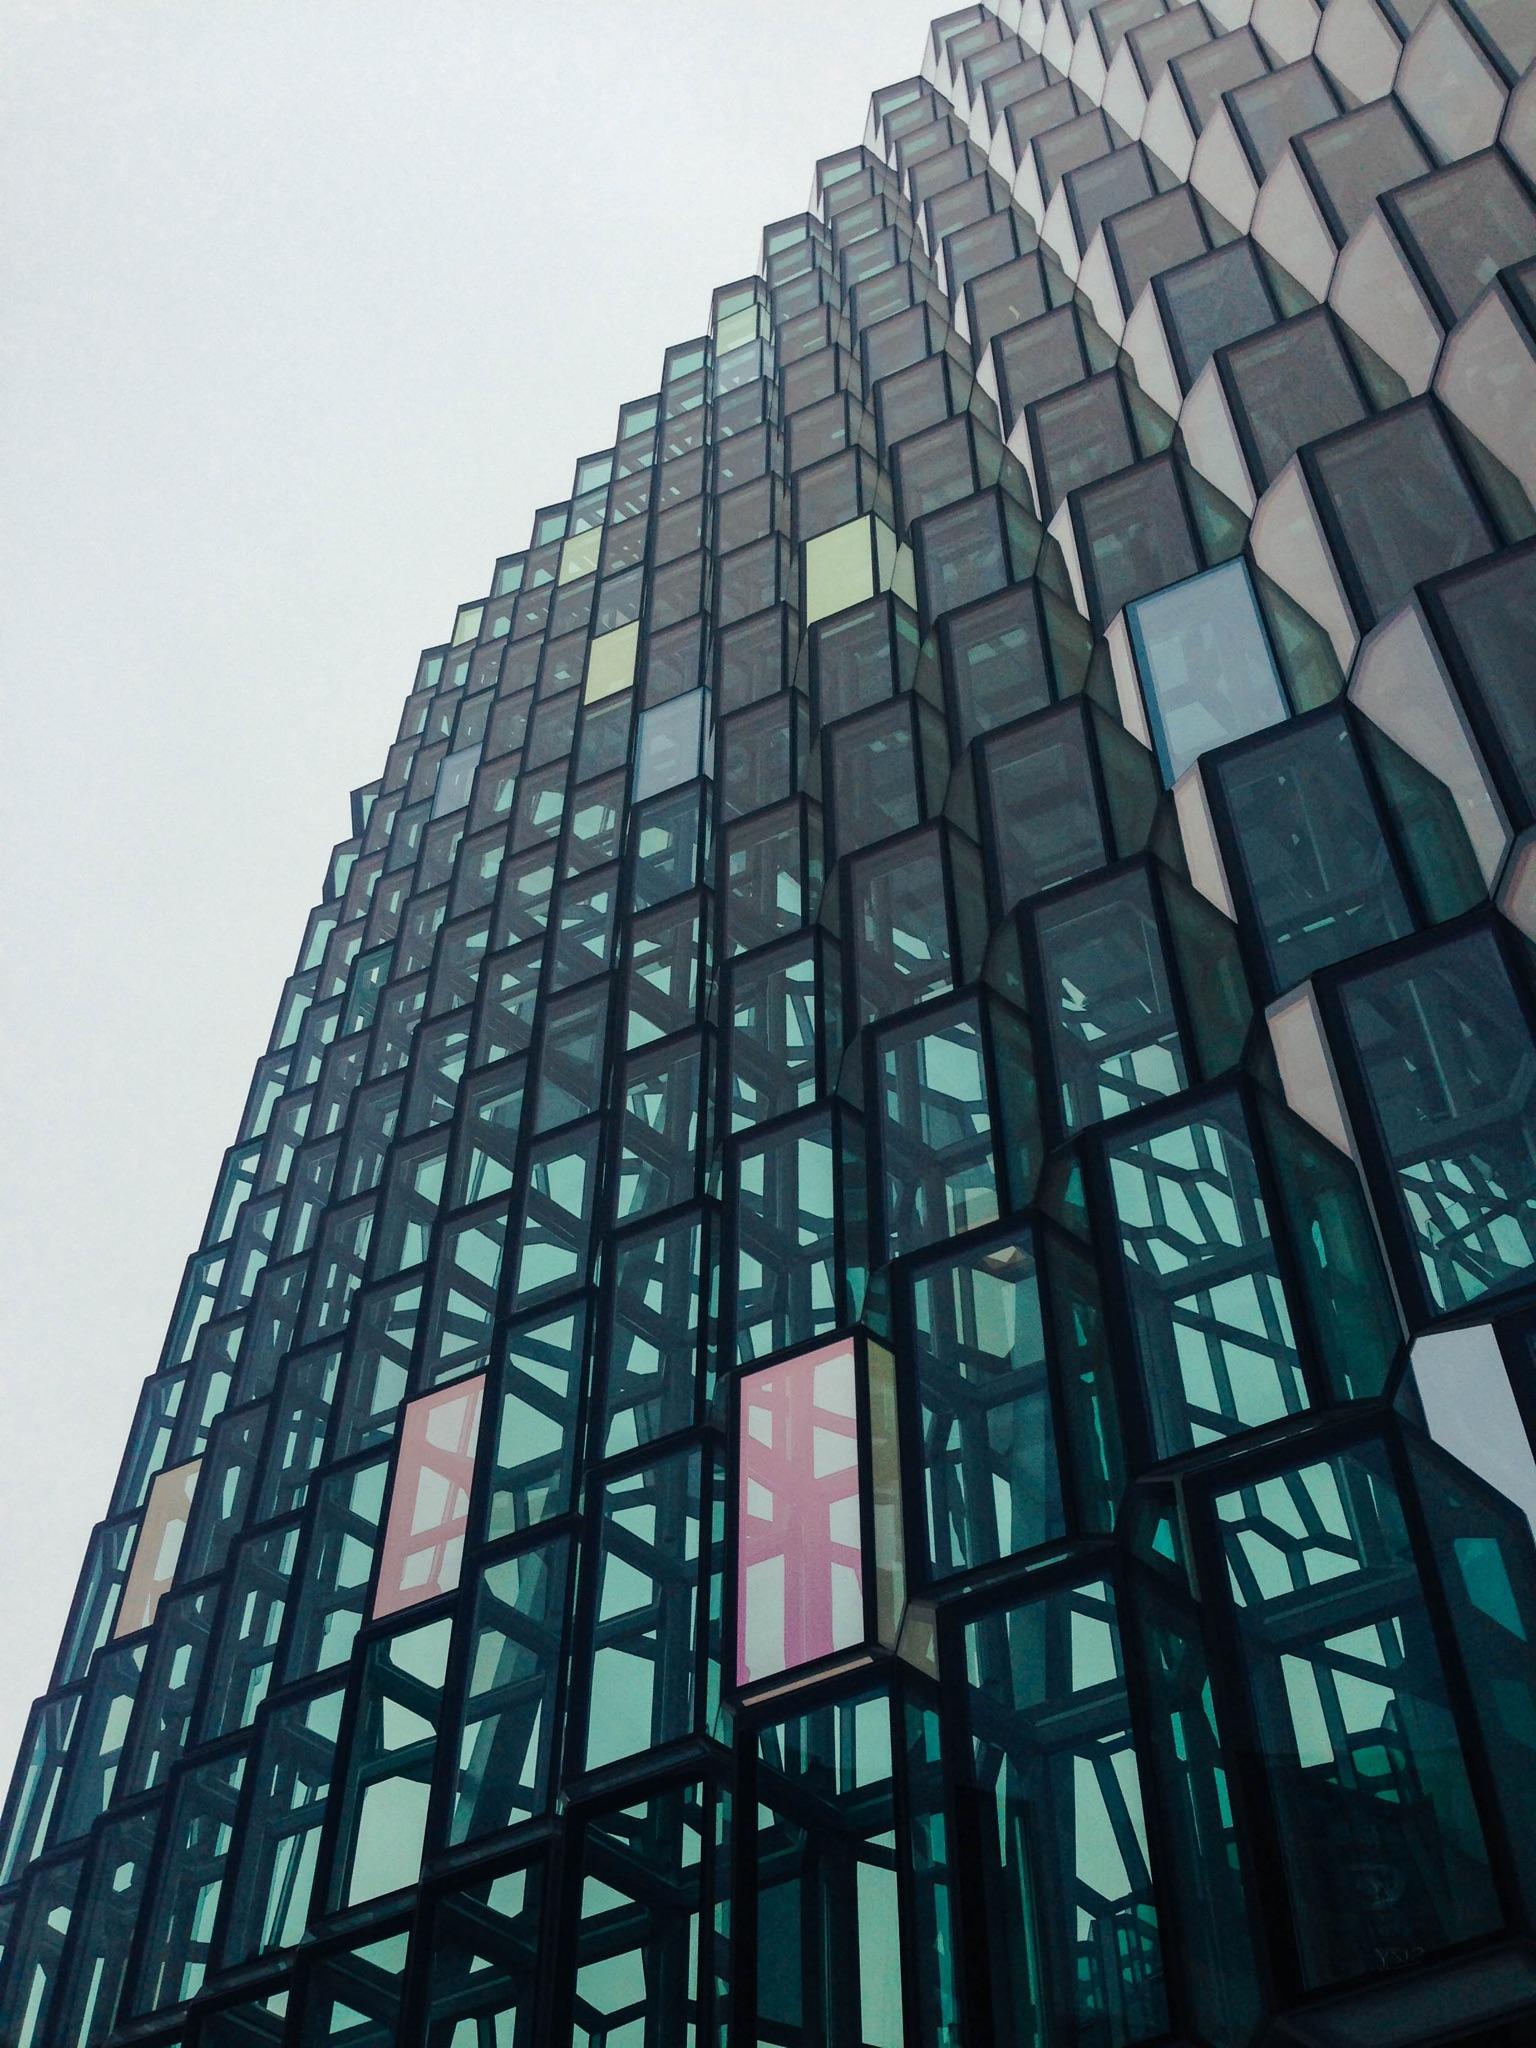 Harpa in Reykjavik, Iceland designed by Olafur Eliasson. [OC] [1536x2048]